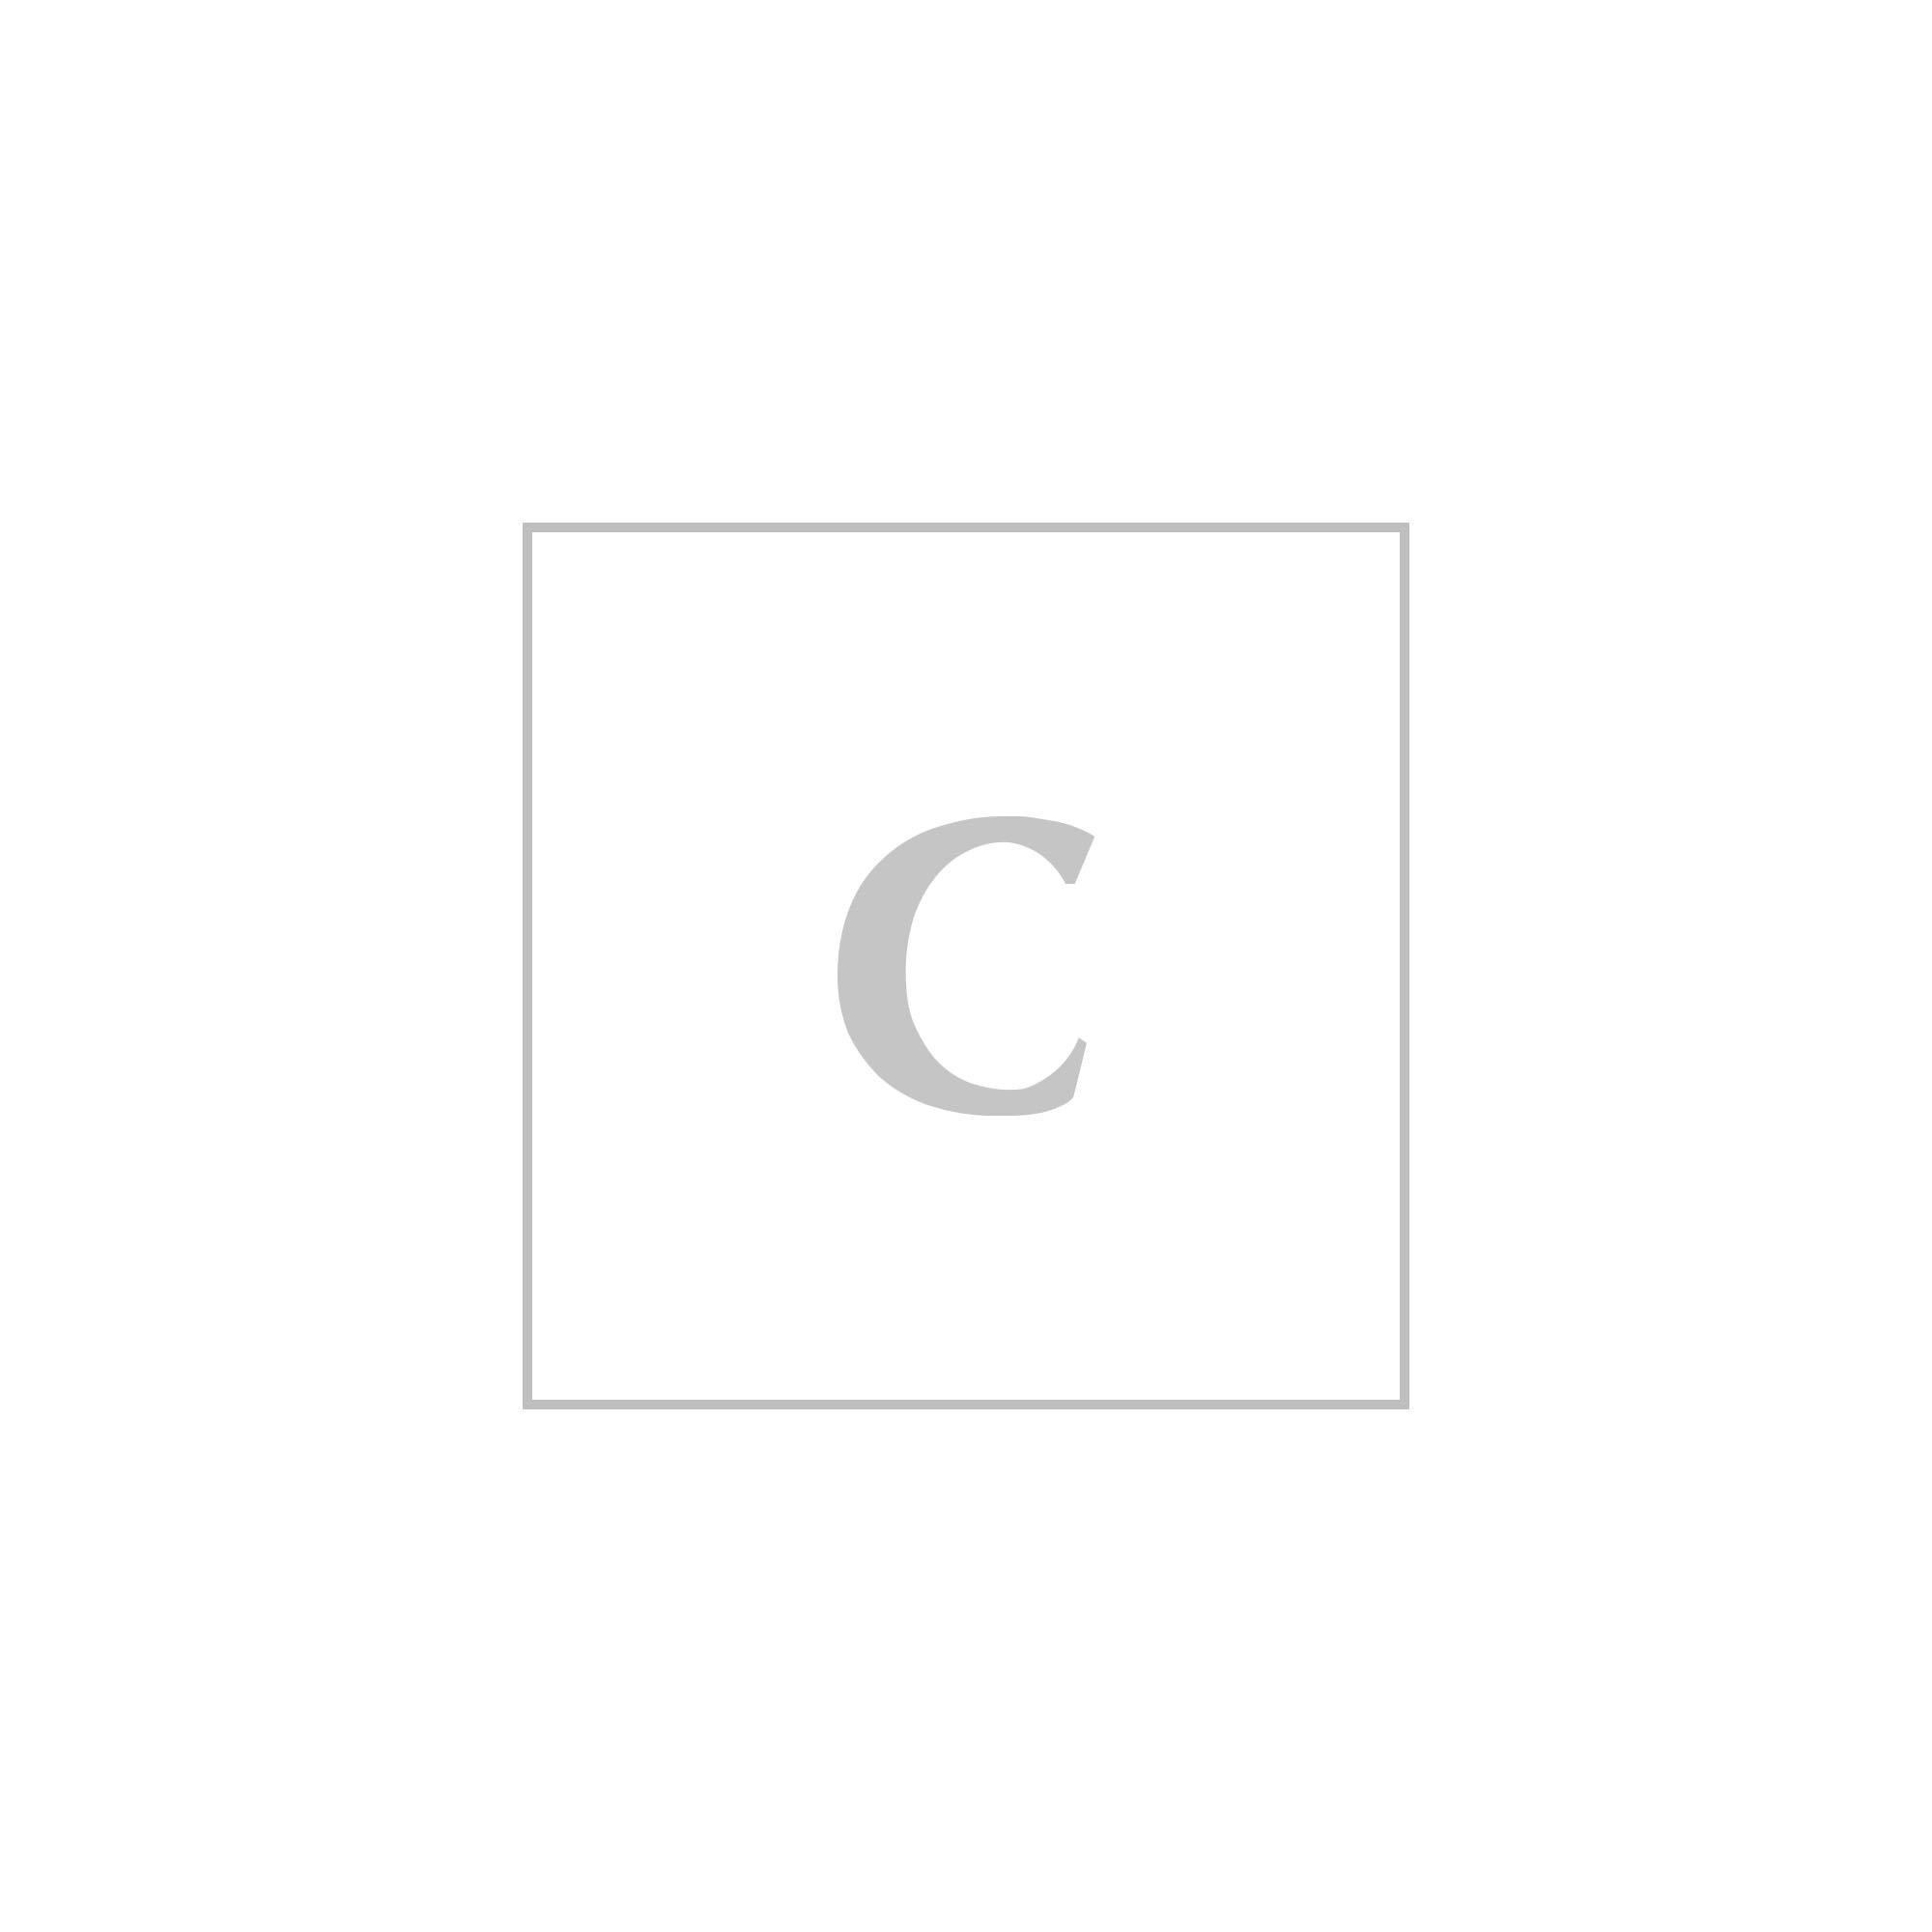 Saint laurent ysl borsa small cabas monogram